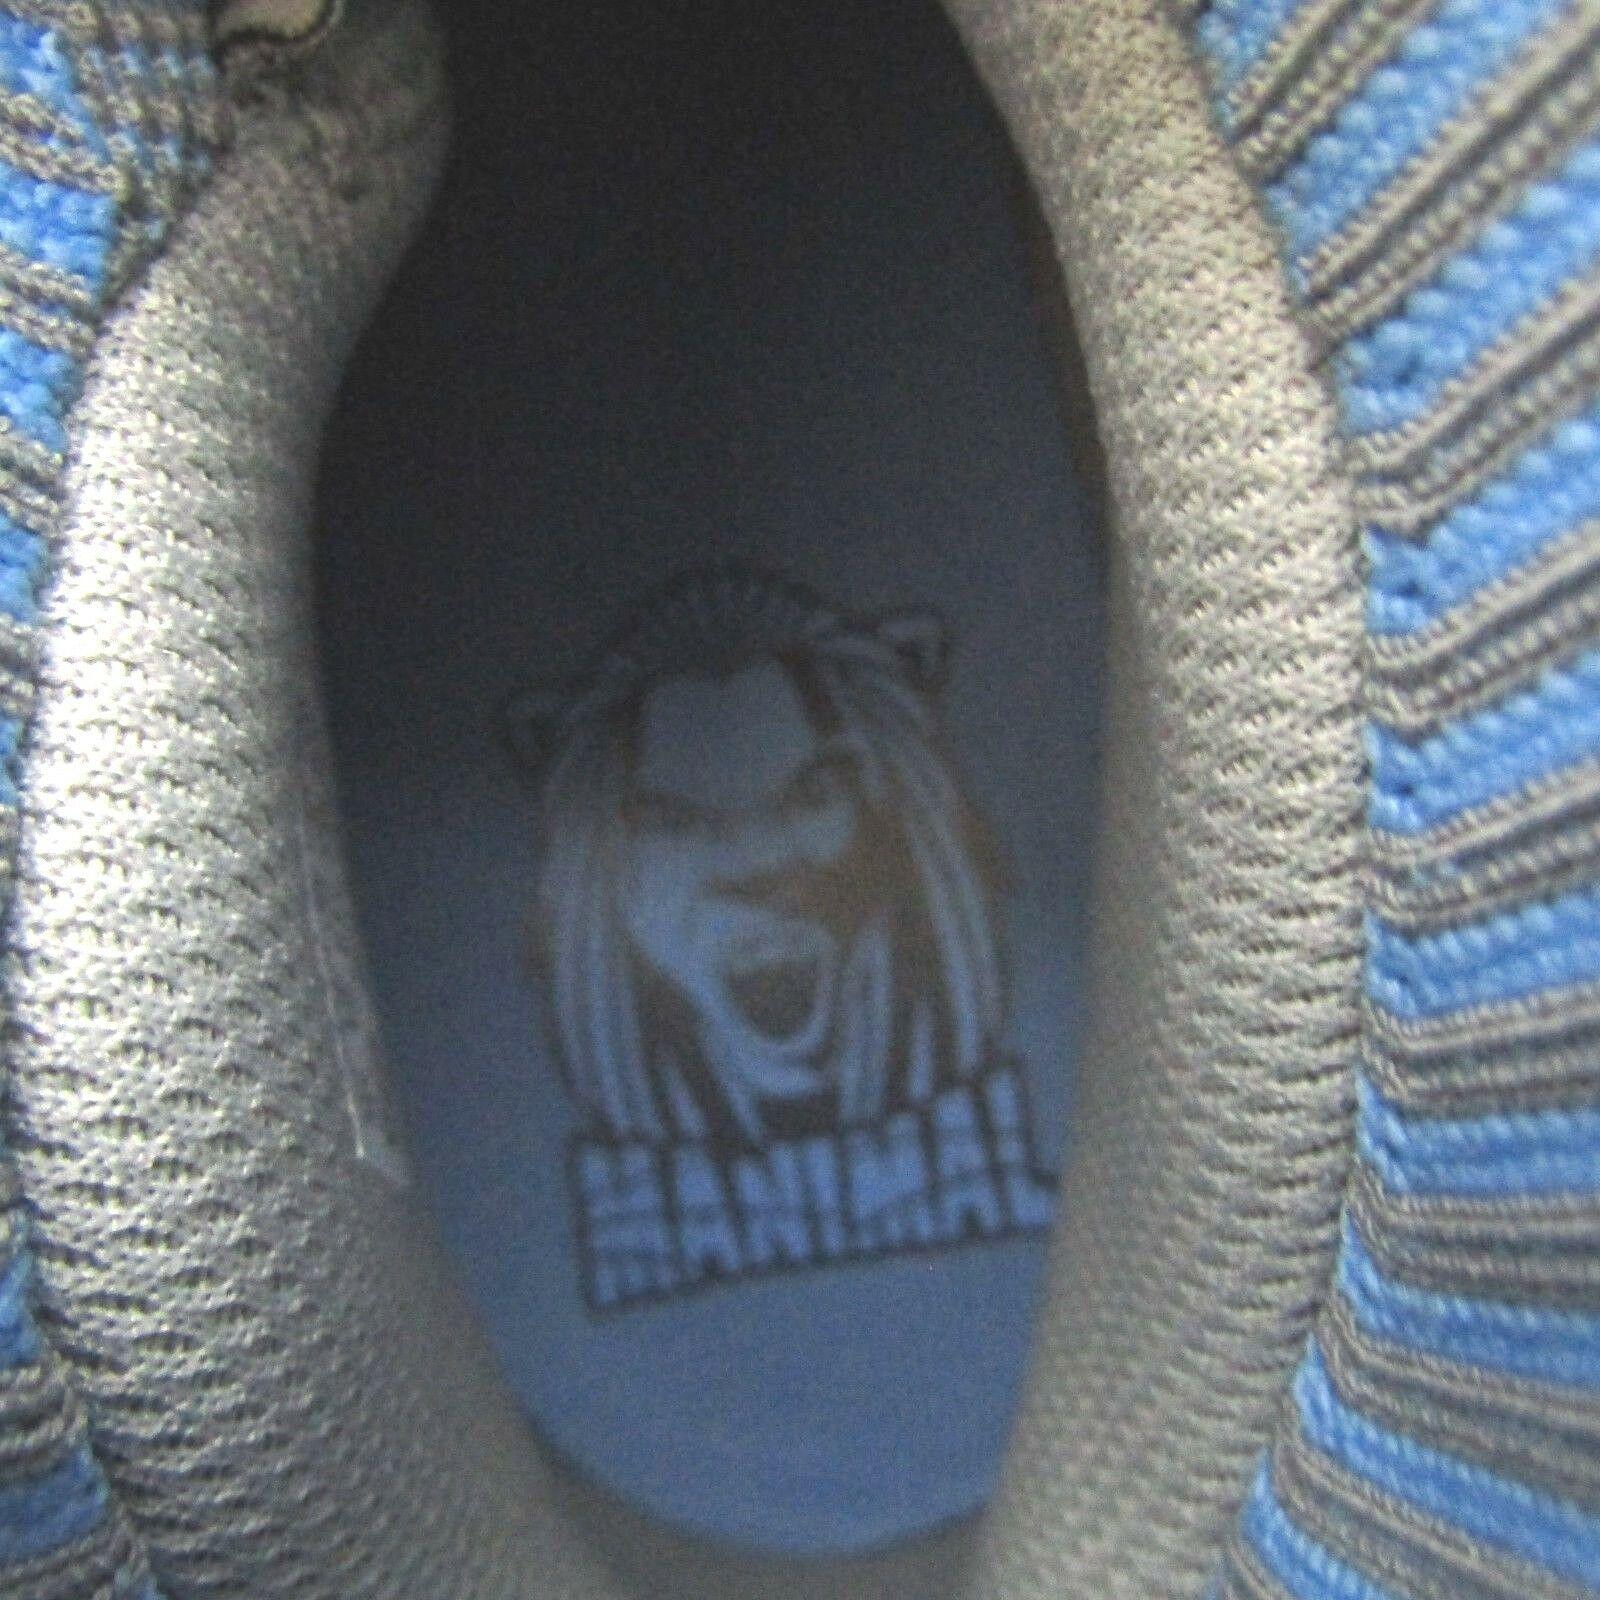 Adidas Crazy Esplosiva Primeknit Kenneth Sonia Ferrari Pe Pepite Nets AC8724 image 6